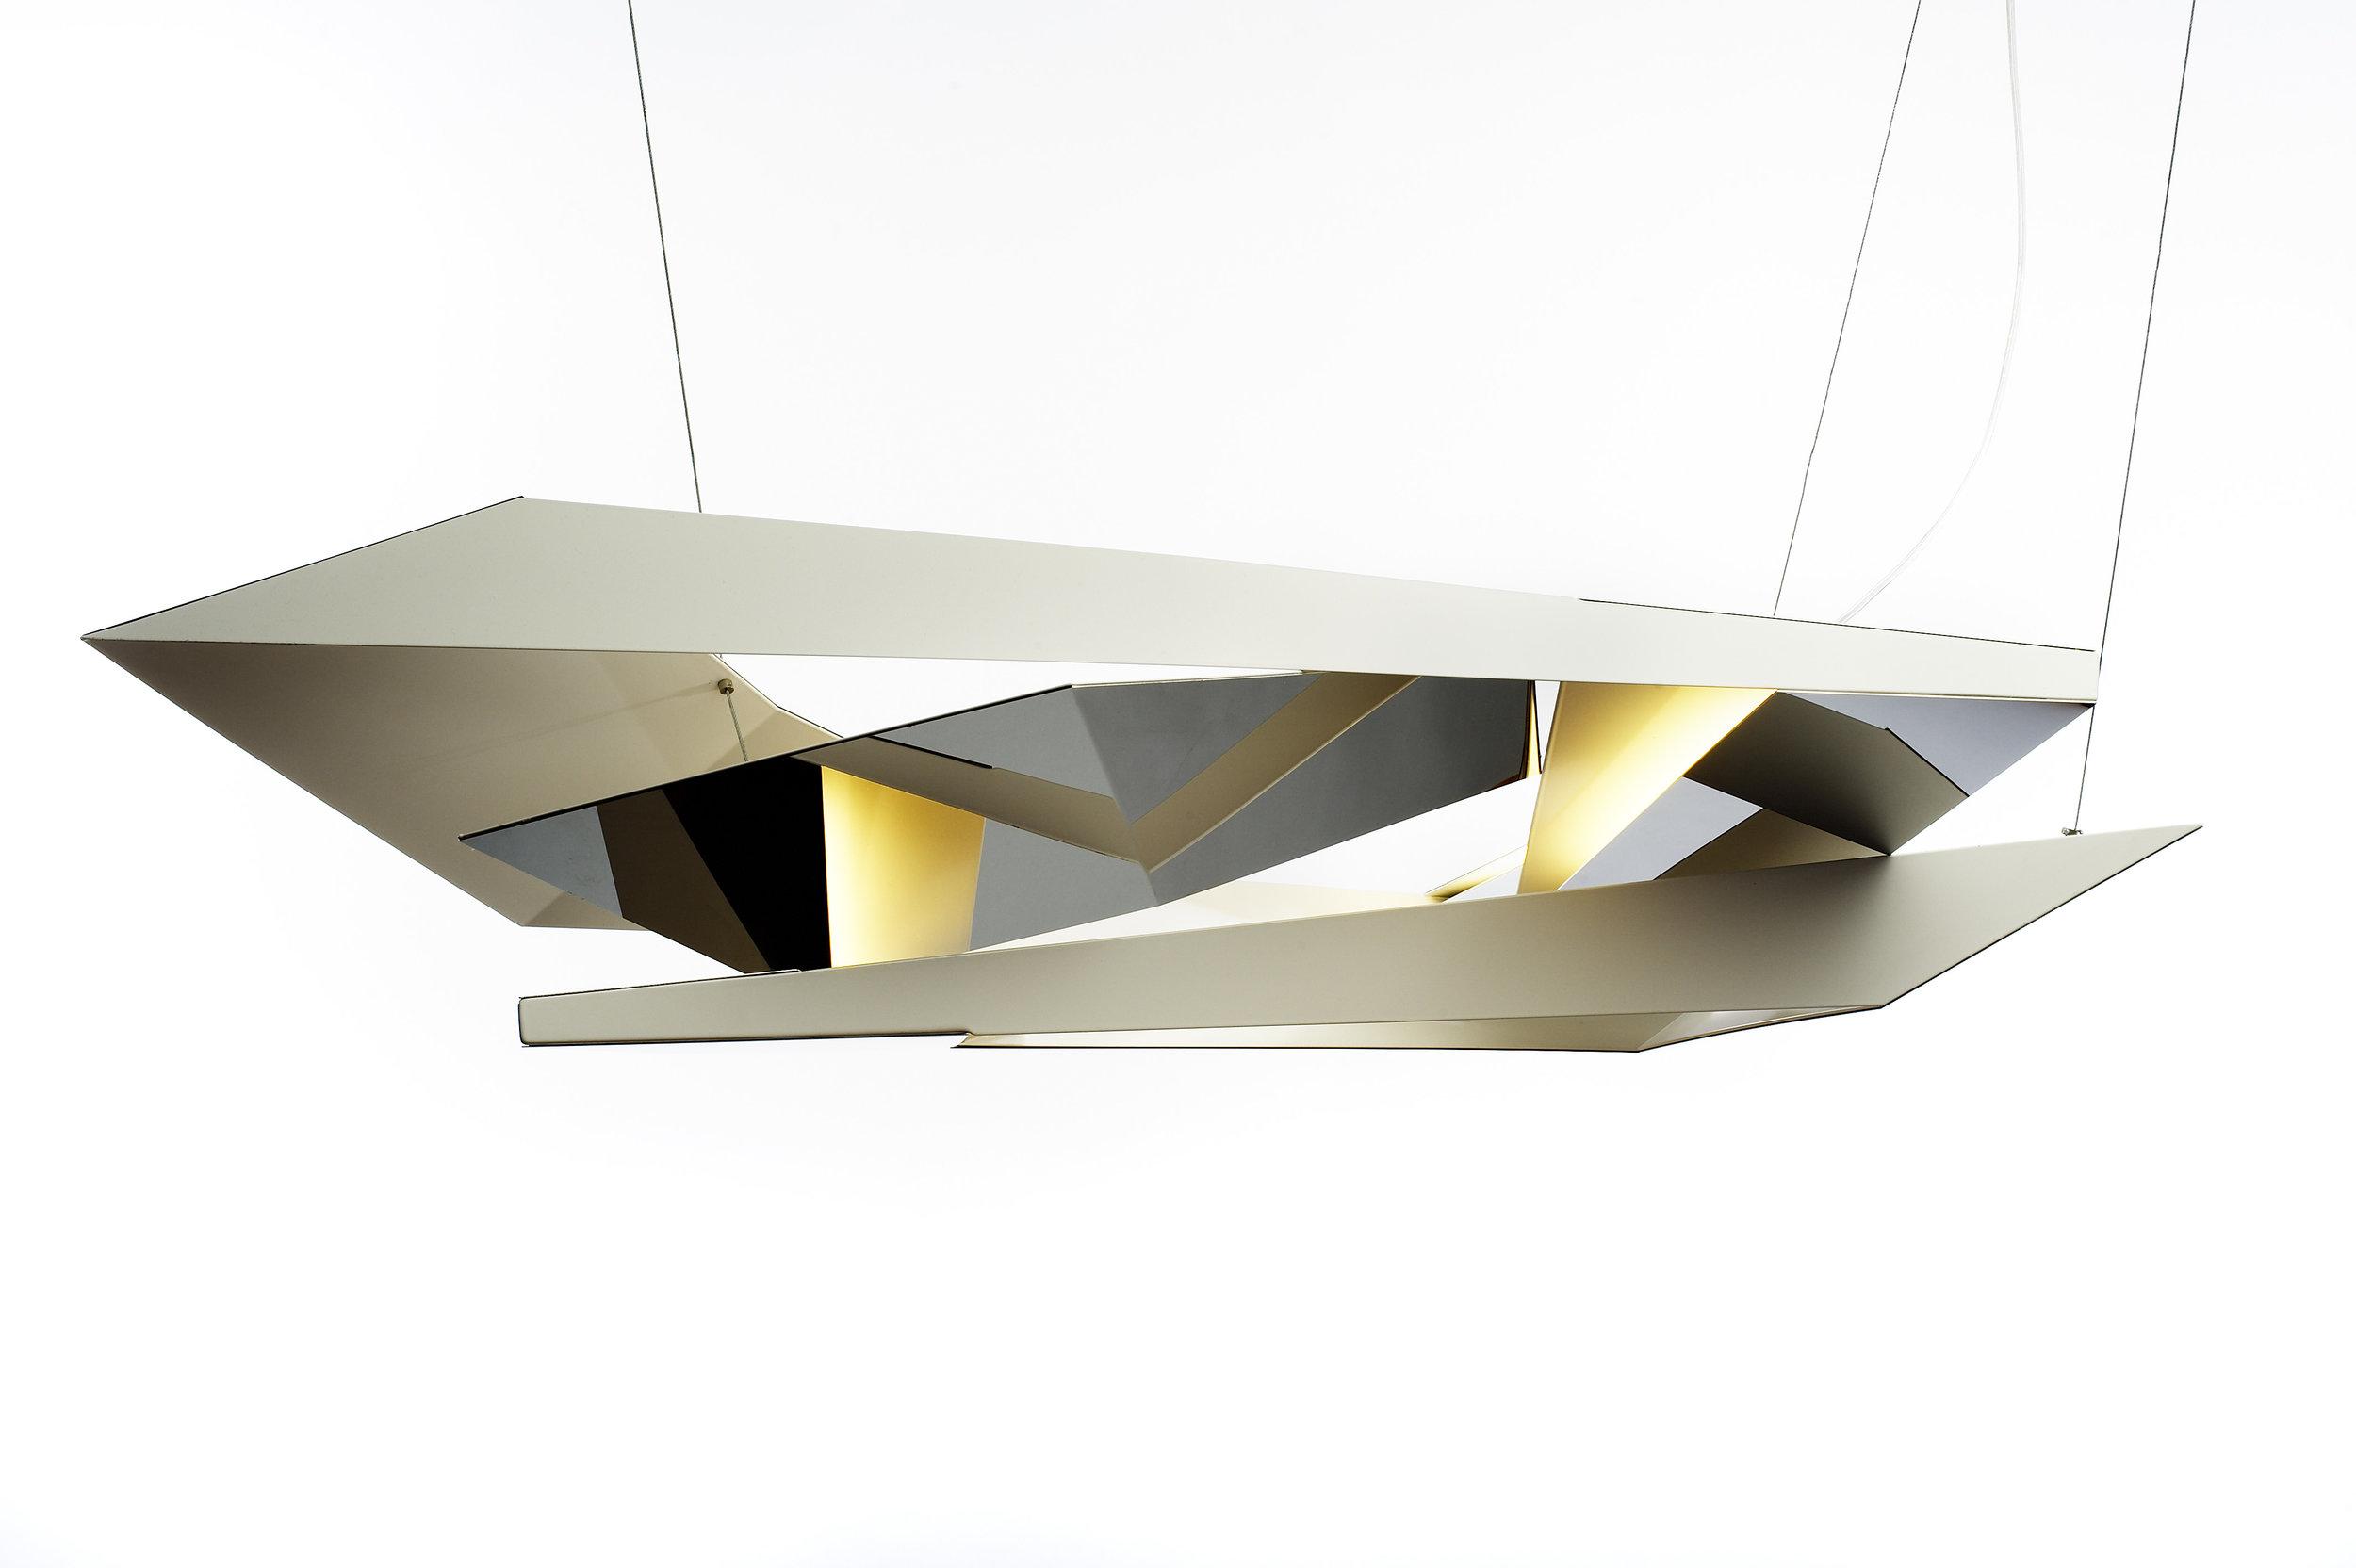 polygon-crash-light_lighting-design_coordination-berlin_04.jpg